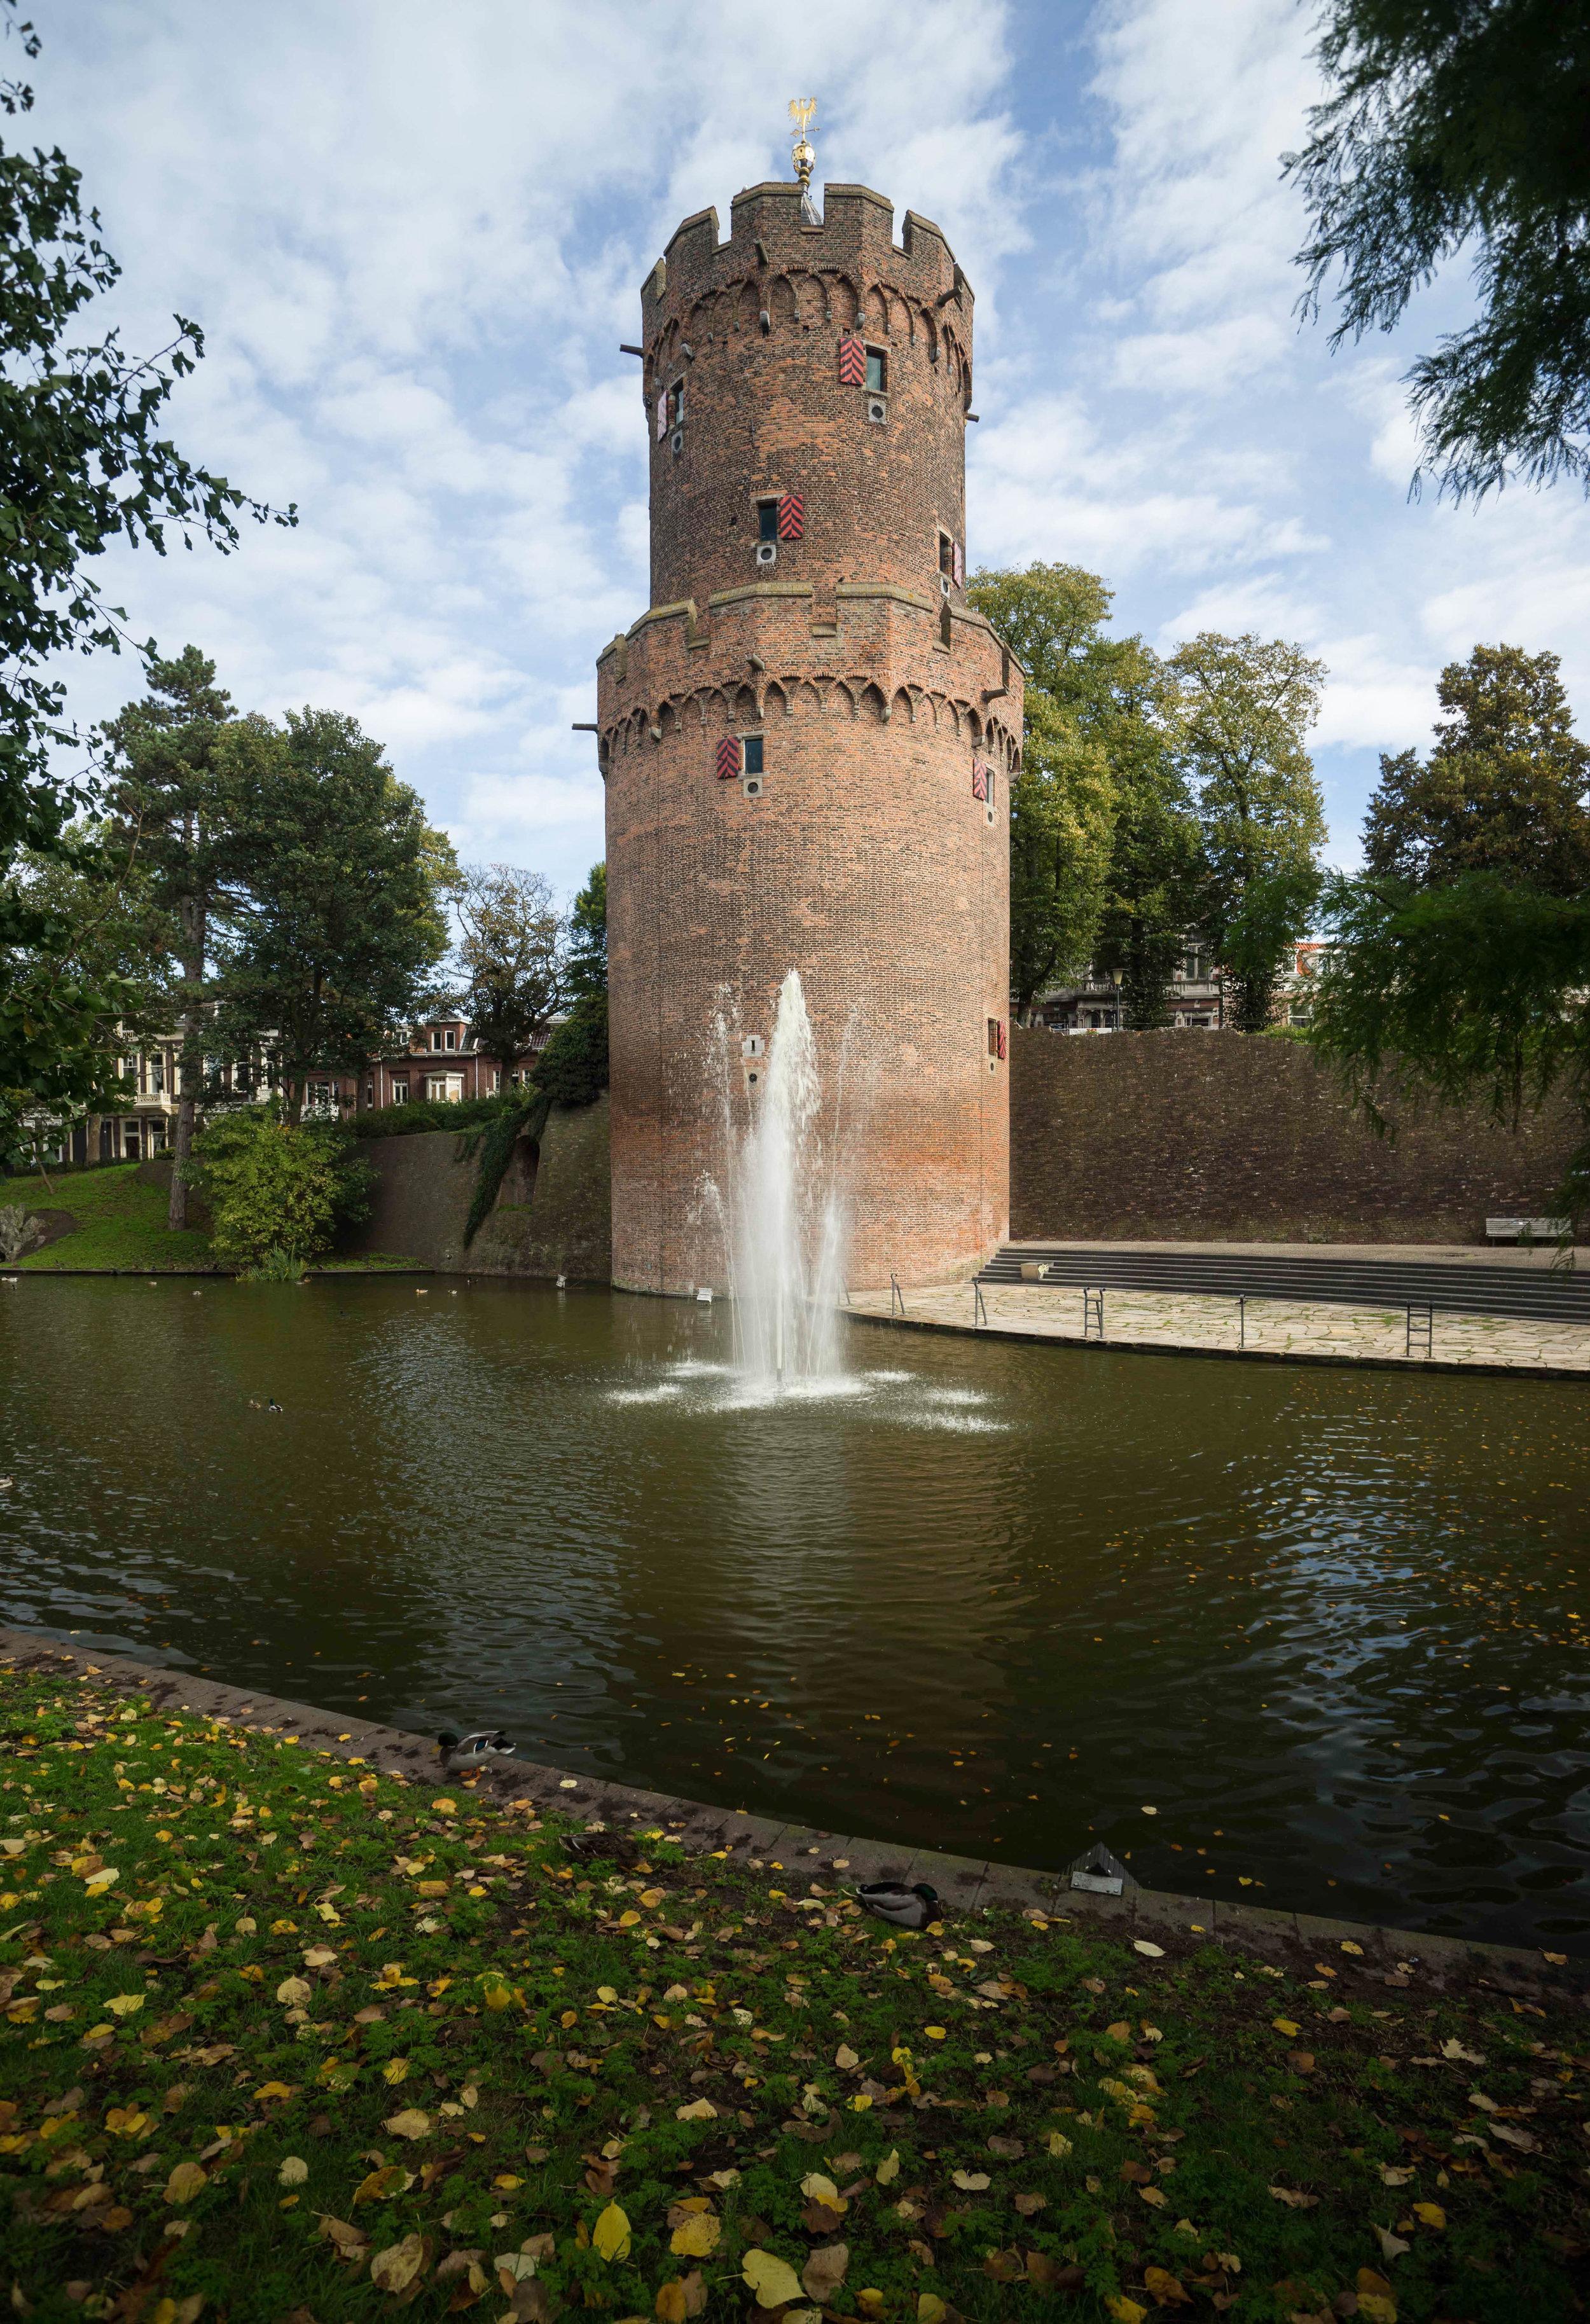 Nederland 10-01-2017 Dev LR-58.jpg